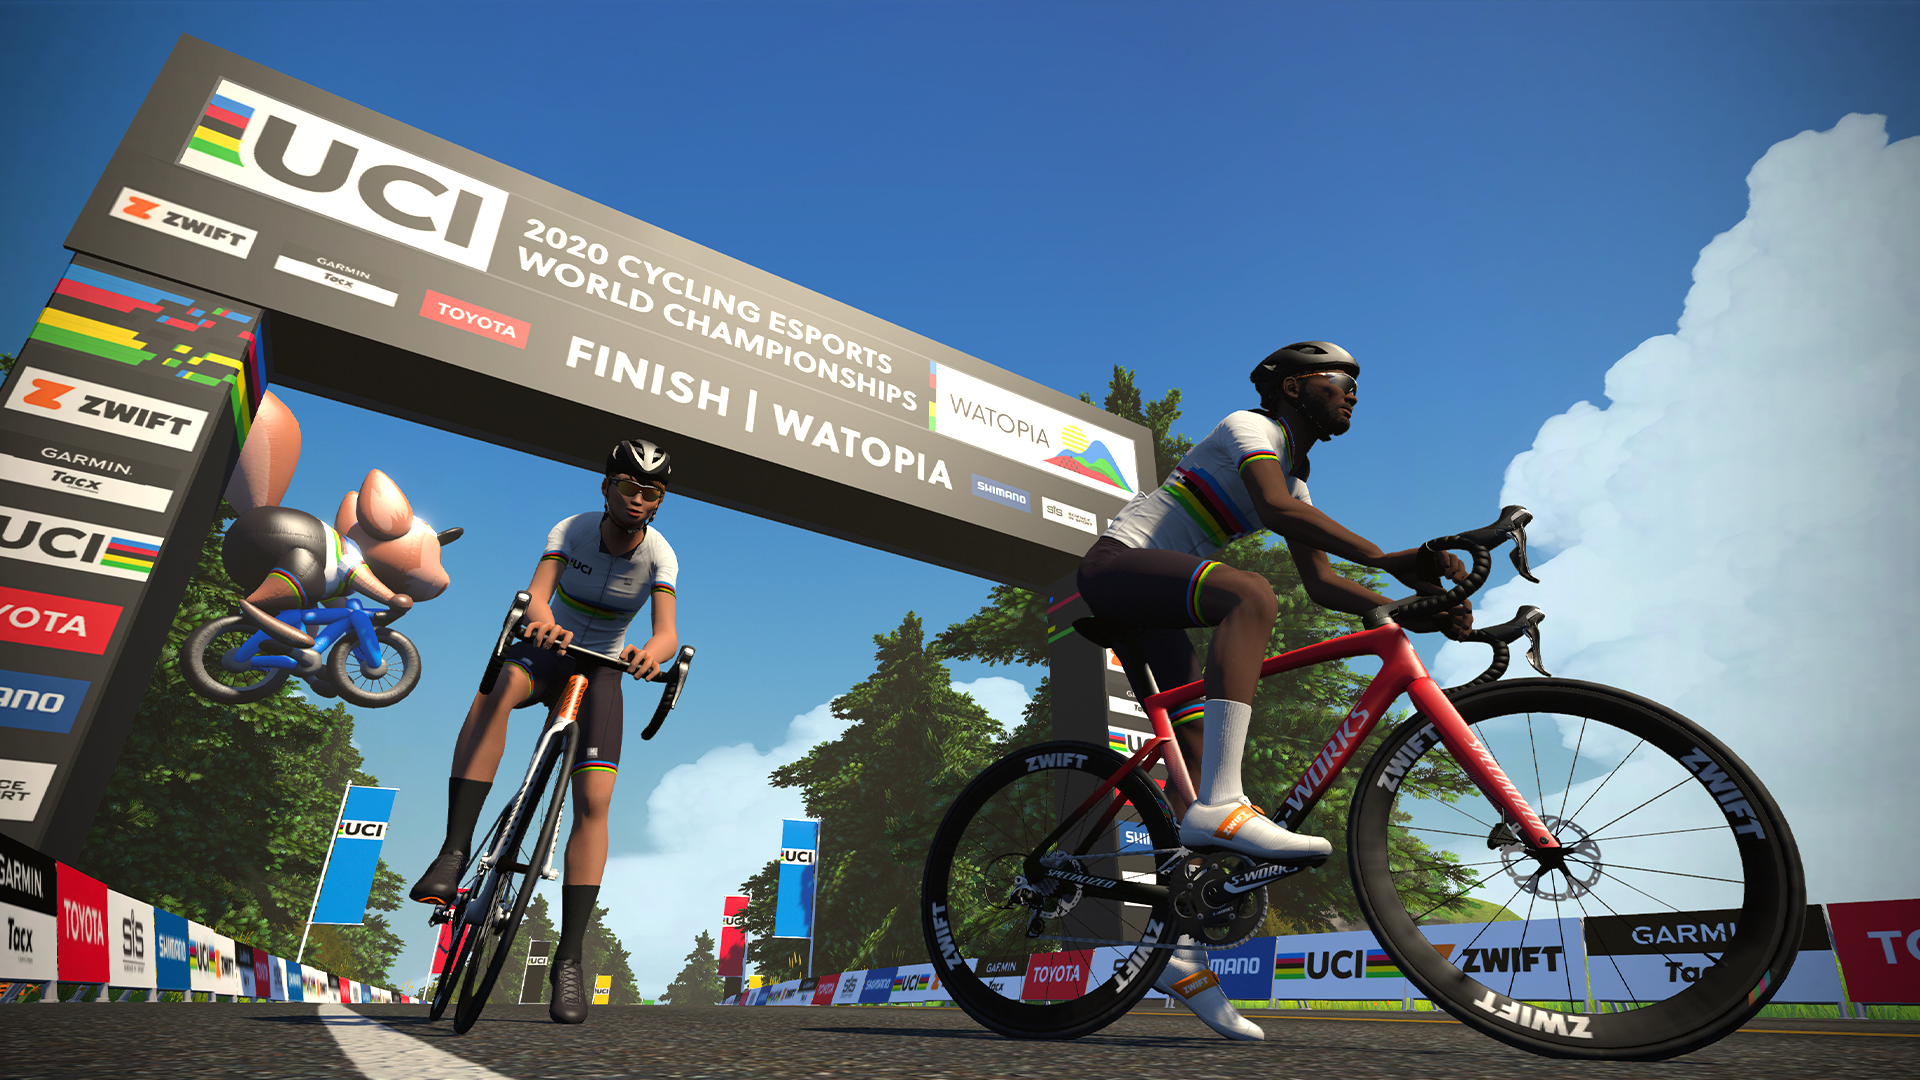 UCI_WC_2020_PR_1.jpg